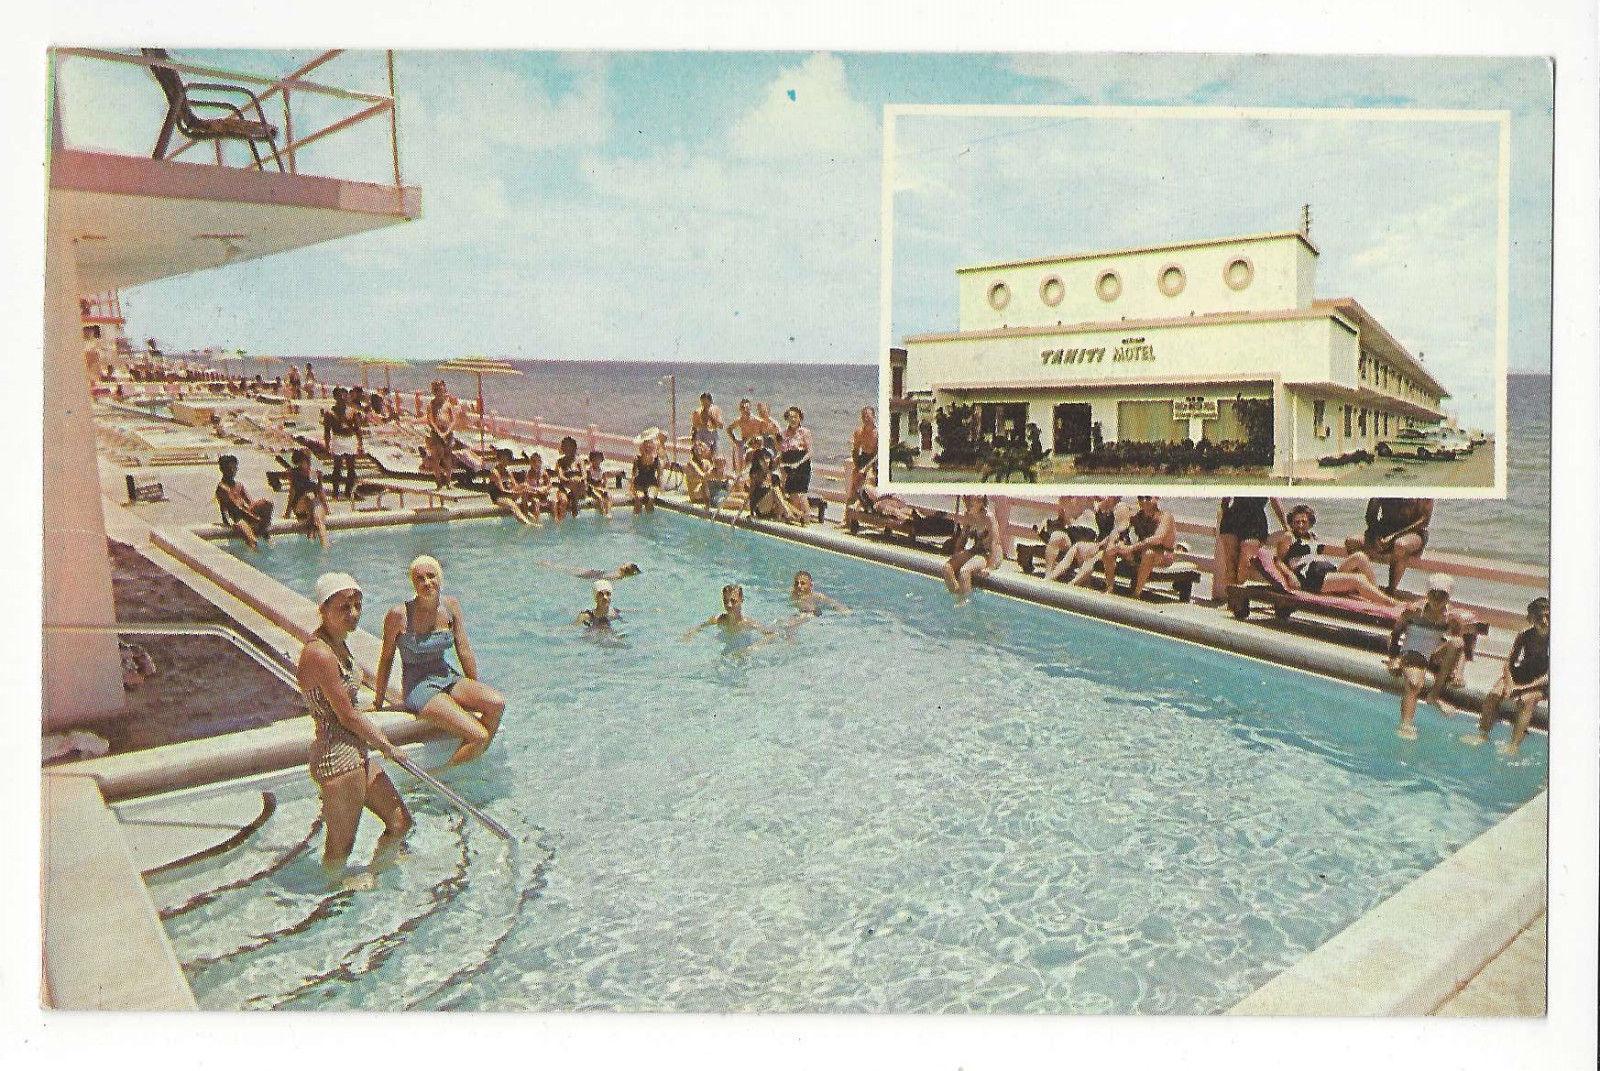 FL Miami Beach Tahiti Motel Swimming Pool Vtg Advertising Postcard